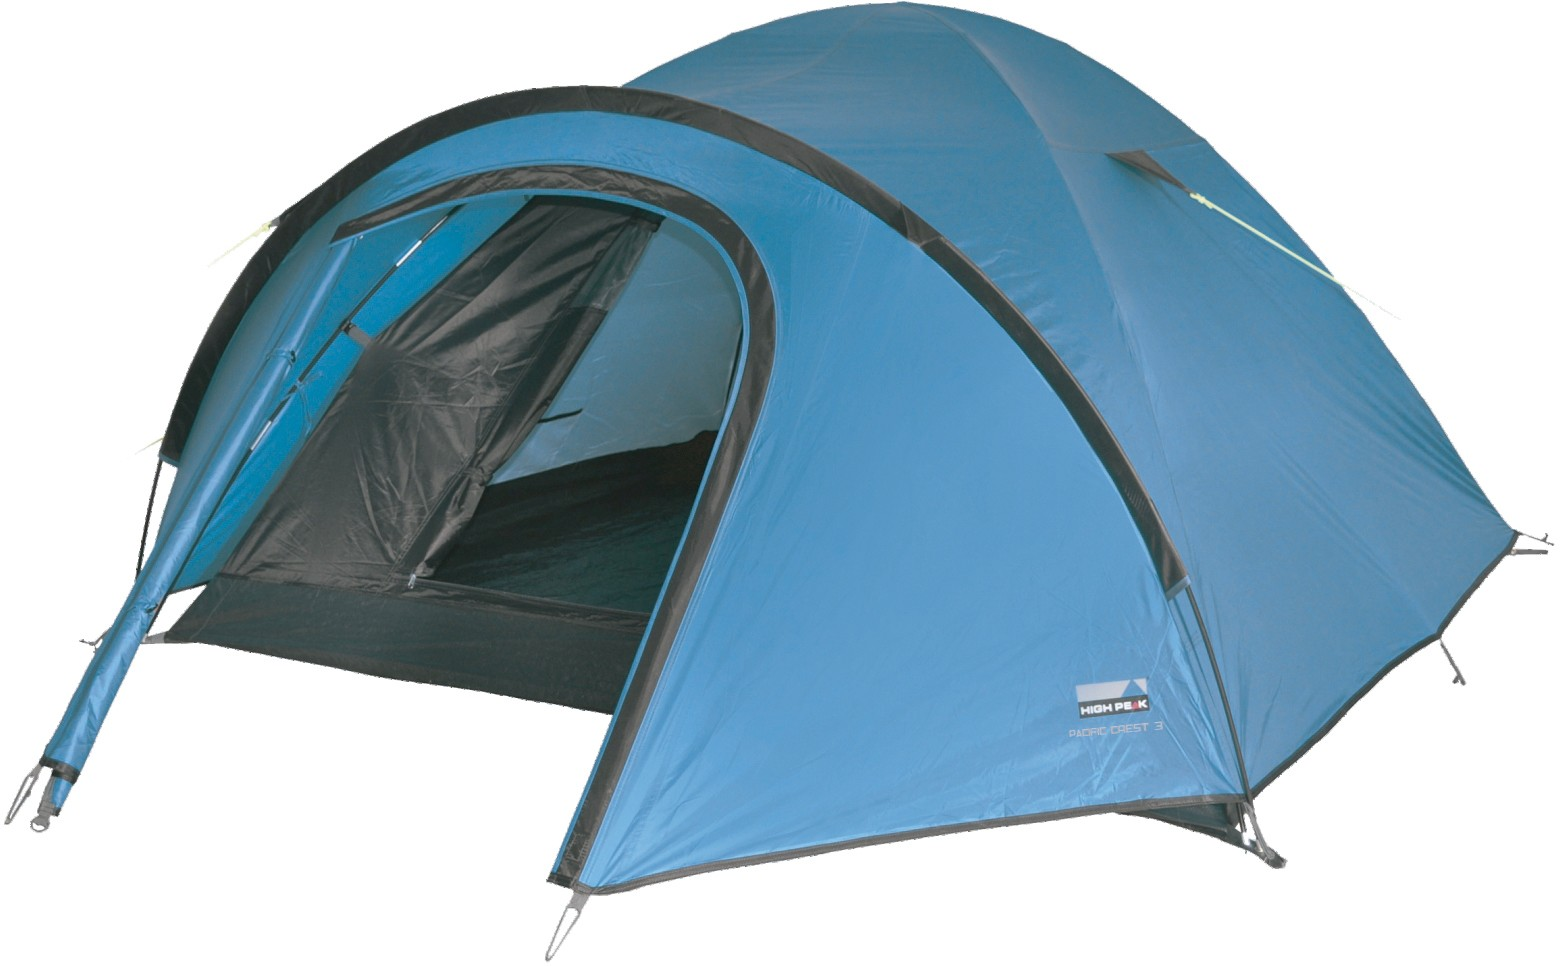 High Peak Pacific Crest 3-Person Tent  sc 1 st  C&ingMaxx.com & Peak Pacific Crest 3-Person Tent